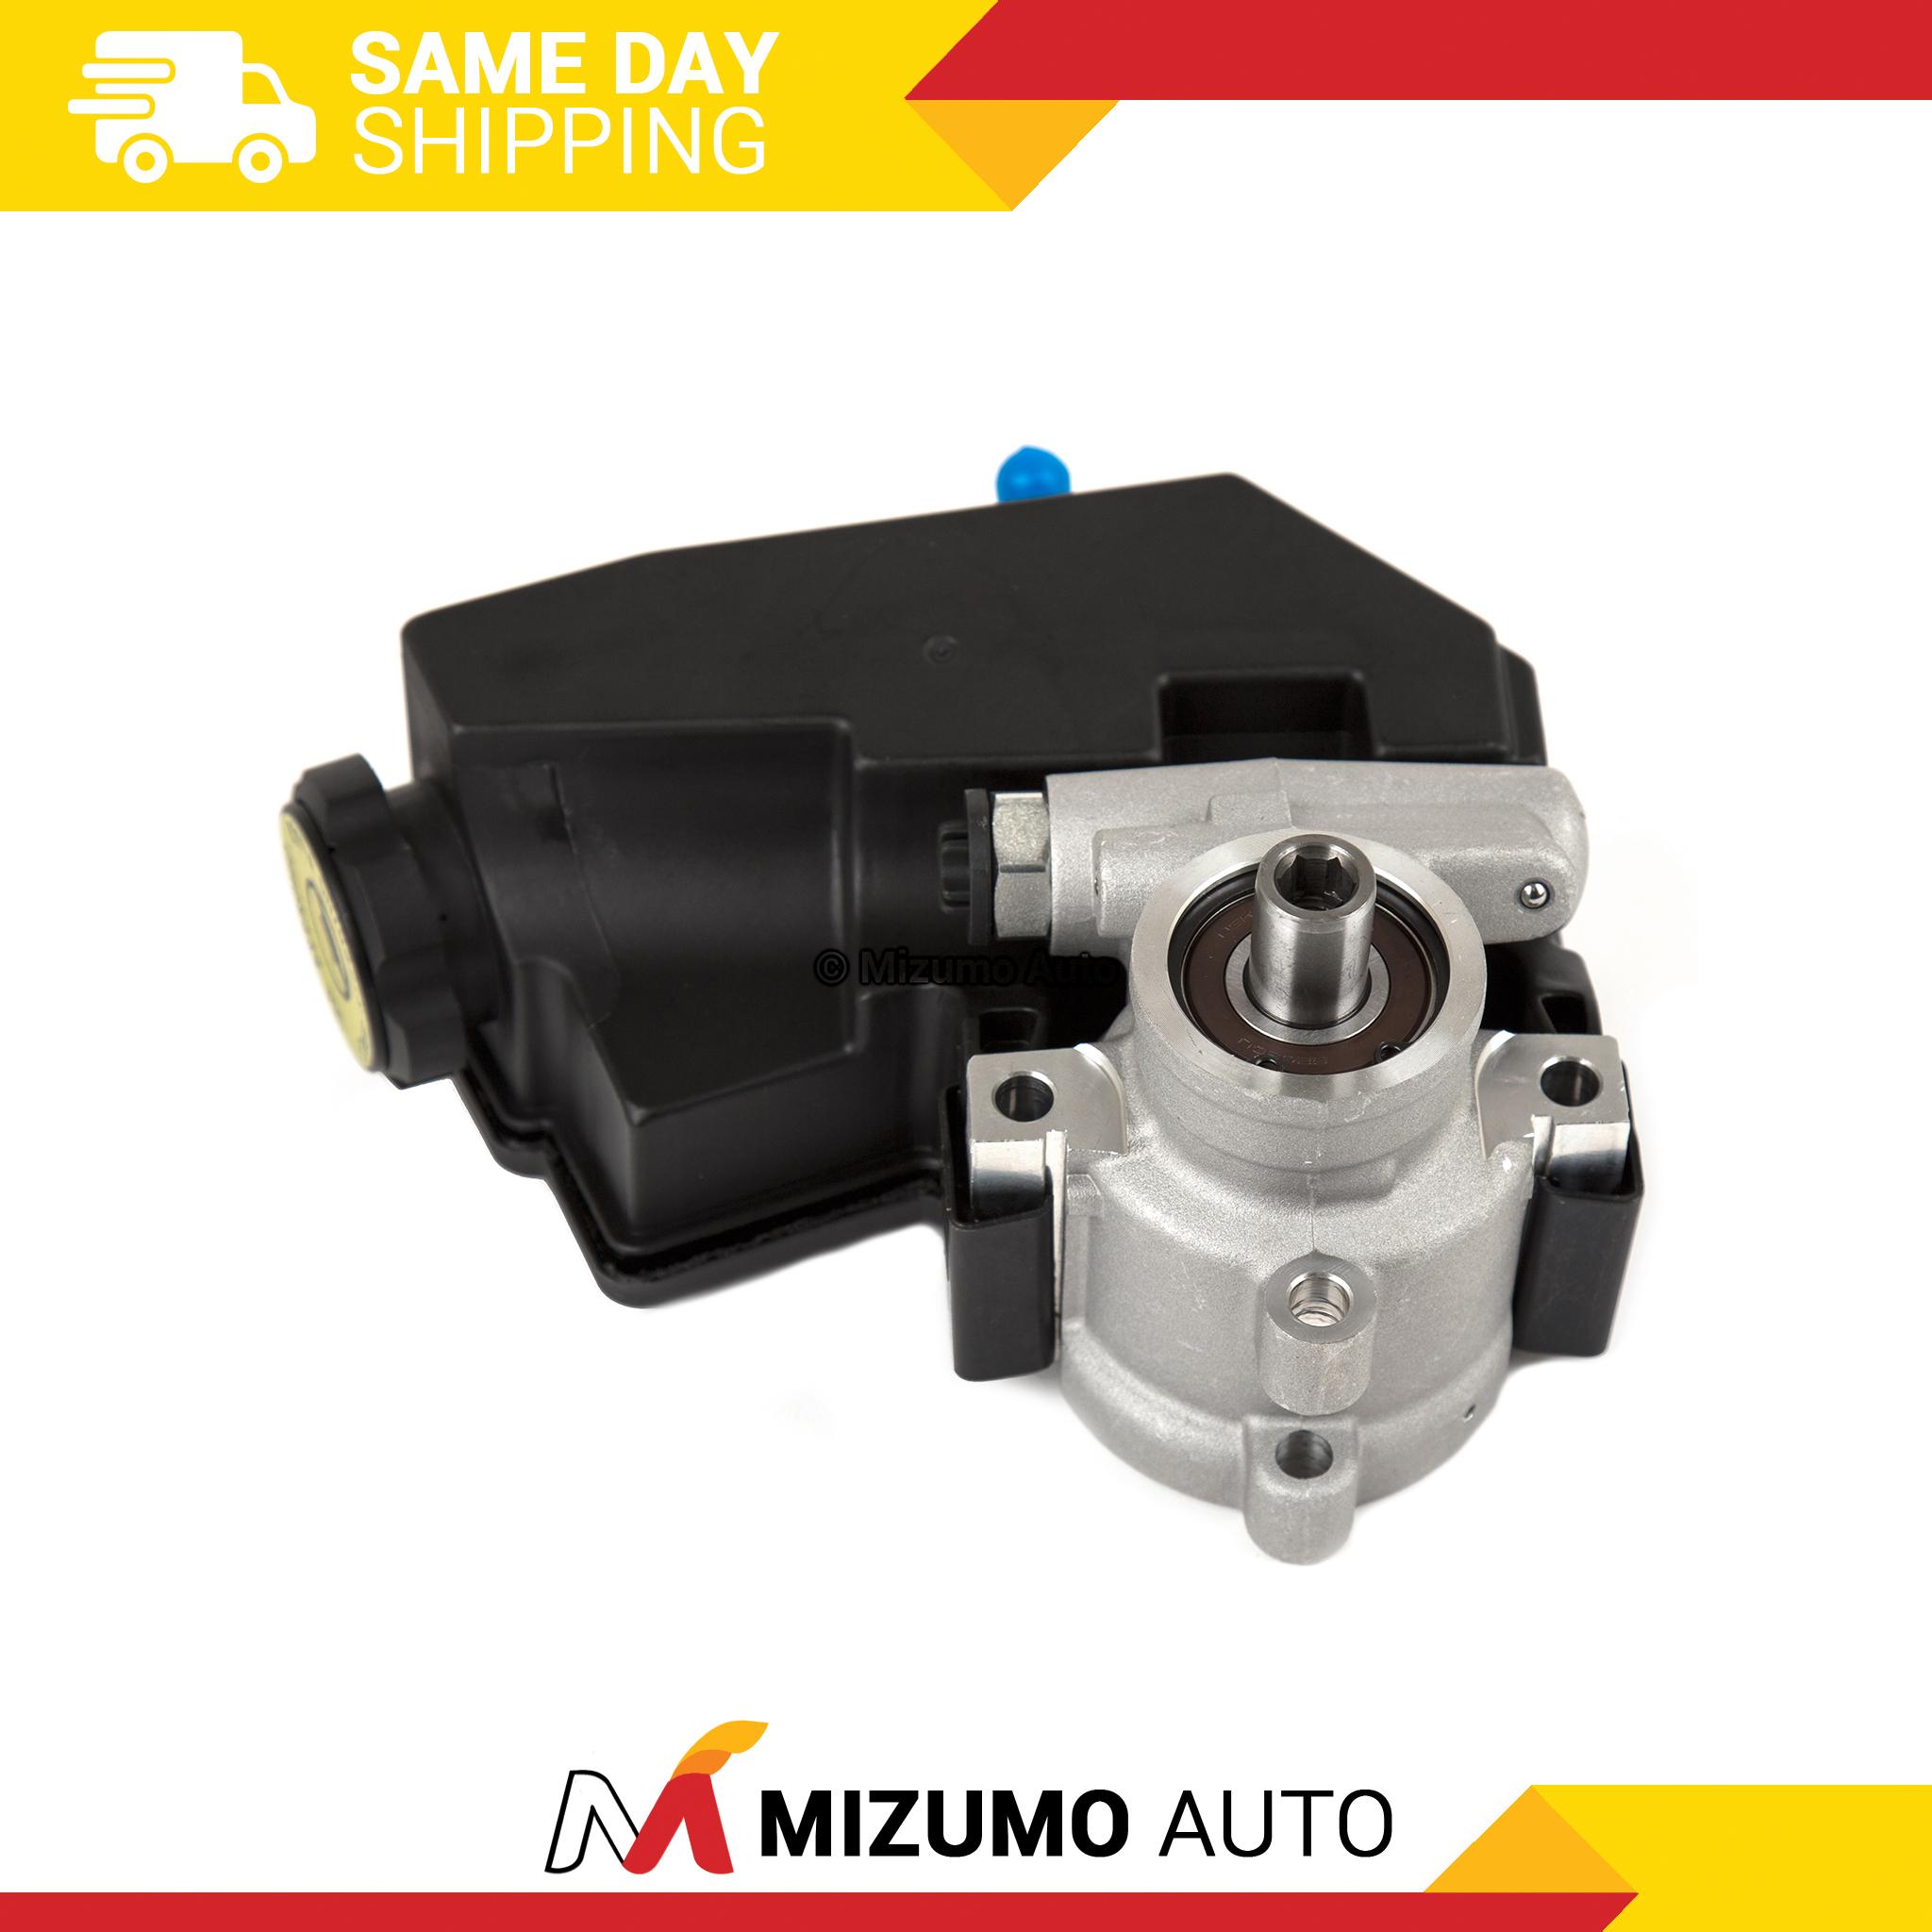 Power-Steering-Pump-w-Reservoir-20-39772-Fit-96-97-Jeep-Grand-Cherokee-4-0L-5-2